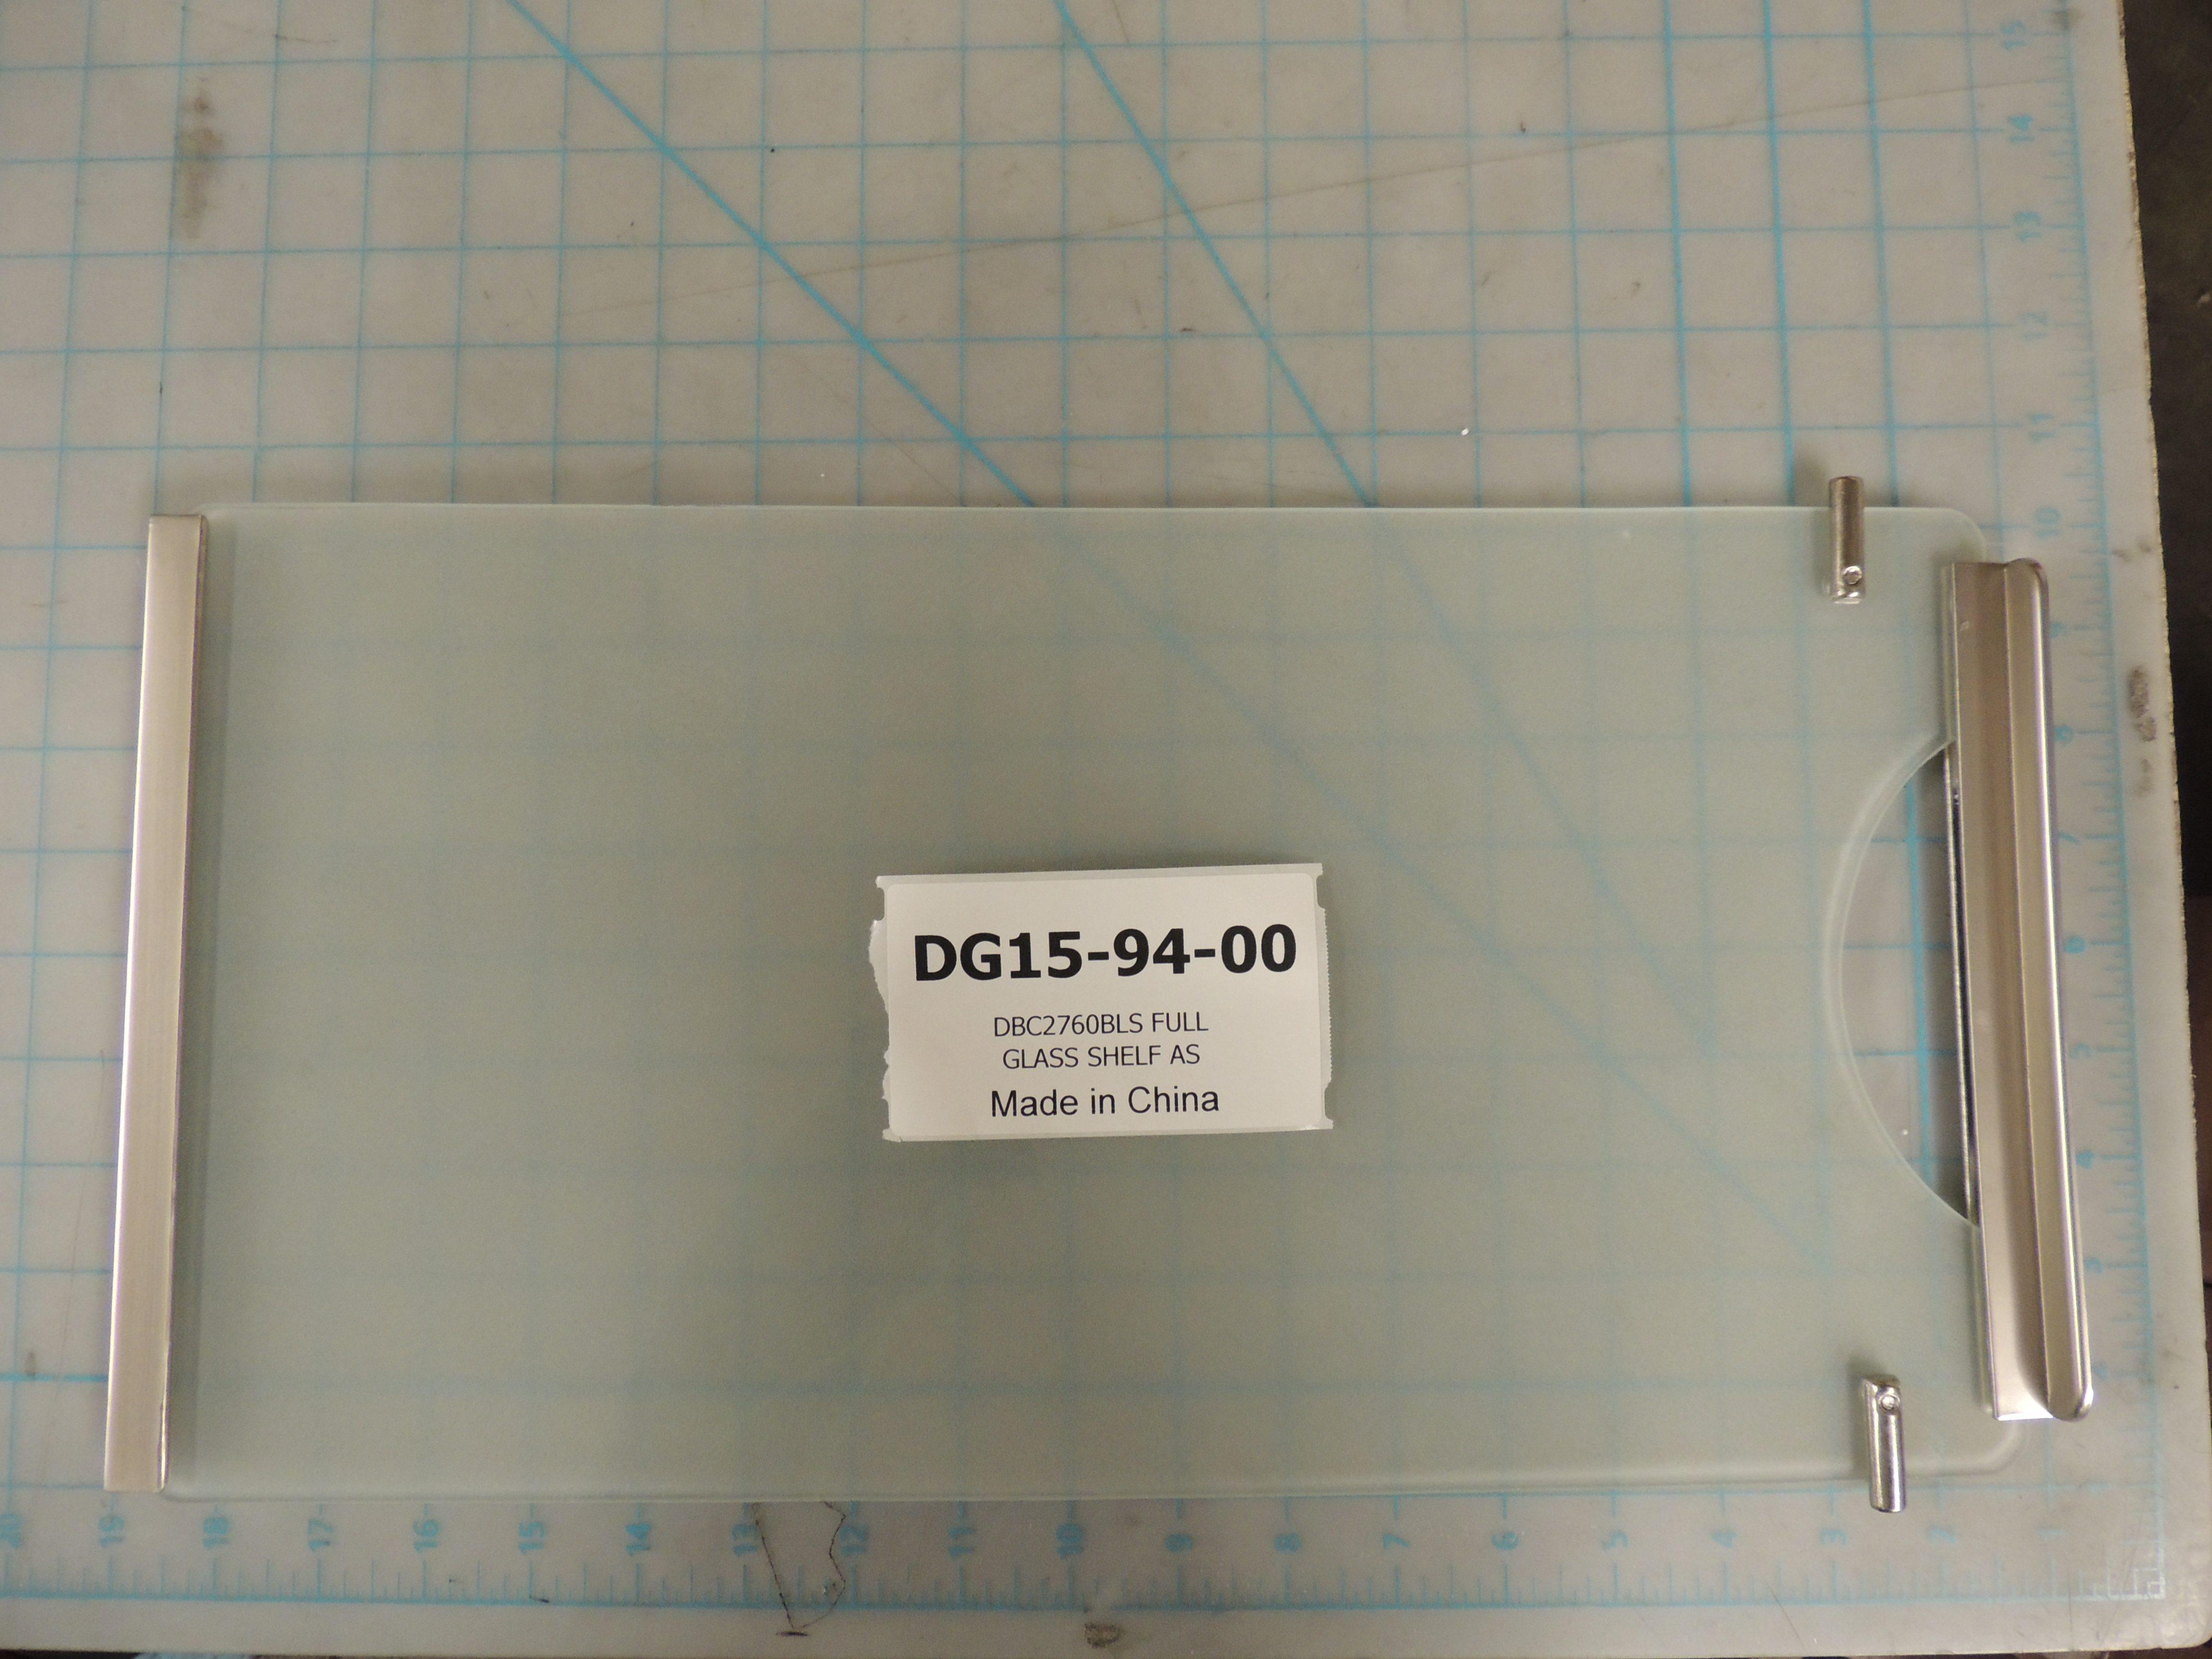 DBC2760 FULL GLASS SHELF KIT